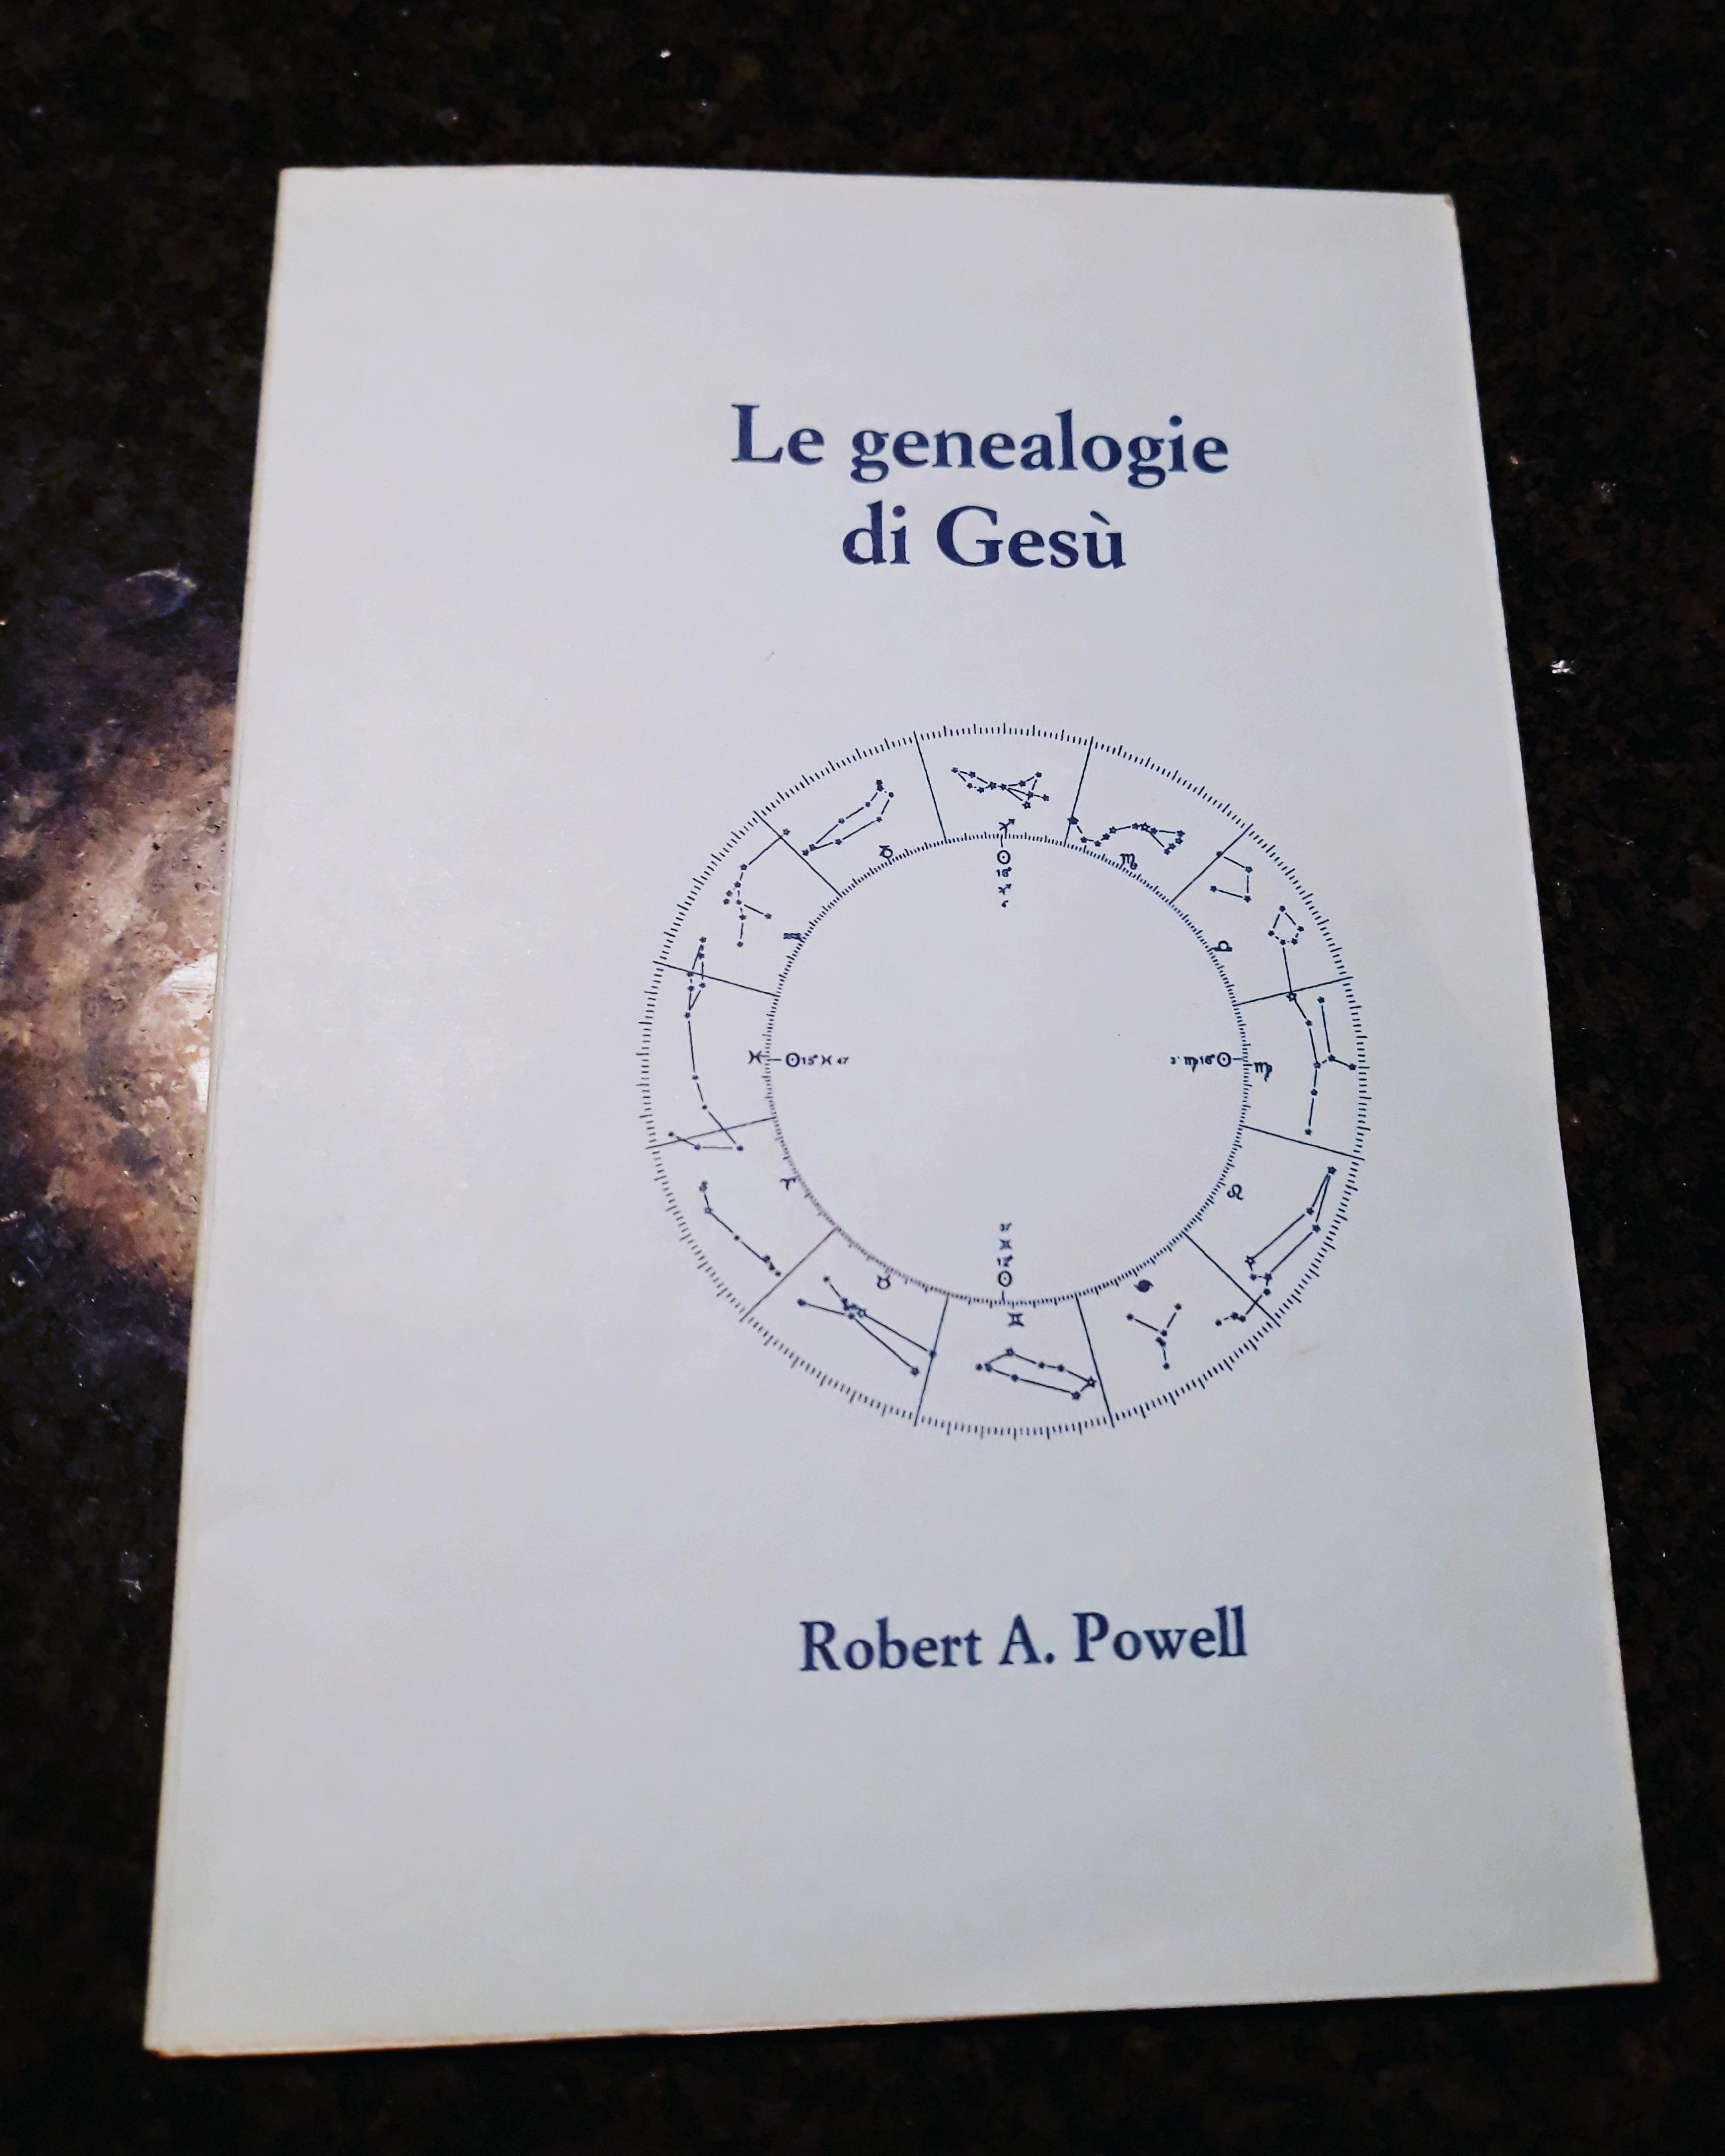 Le genealogie di Gesù